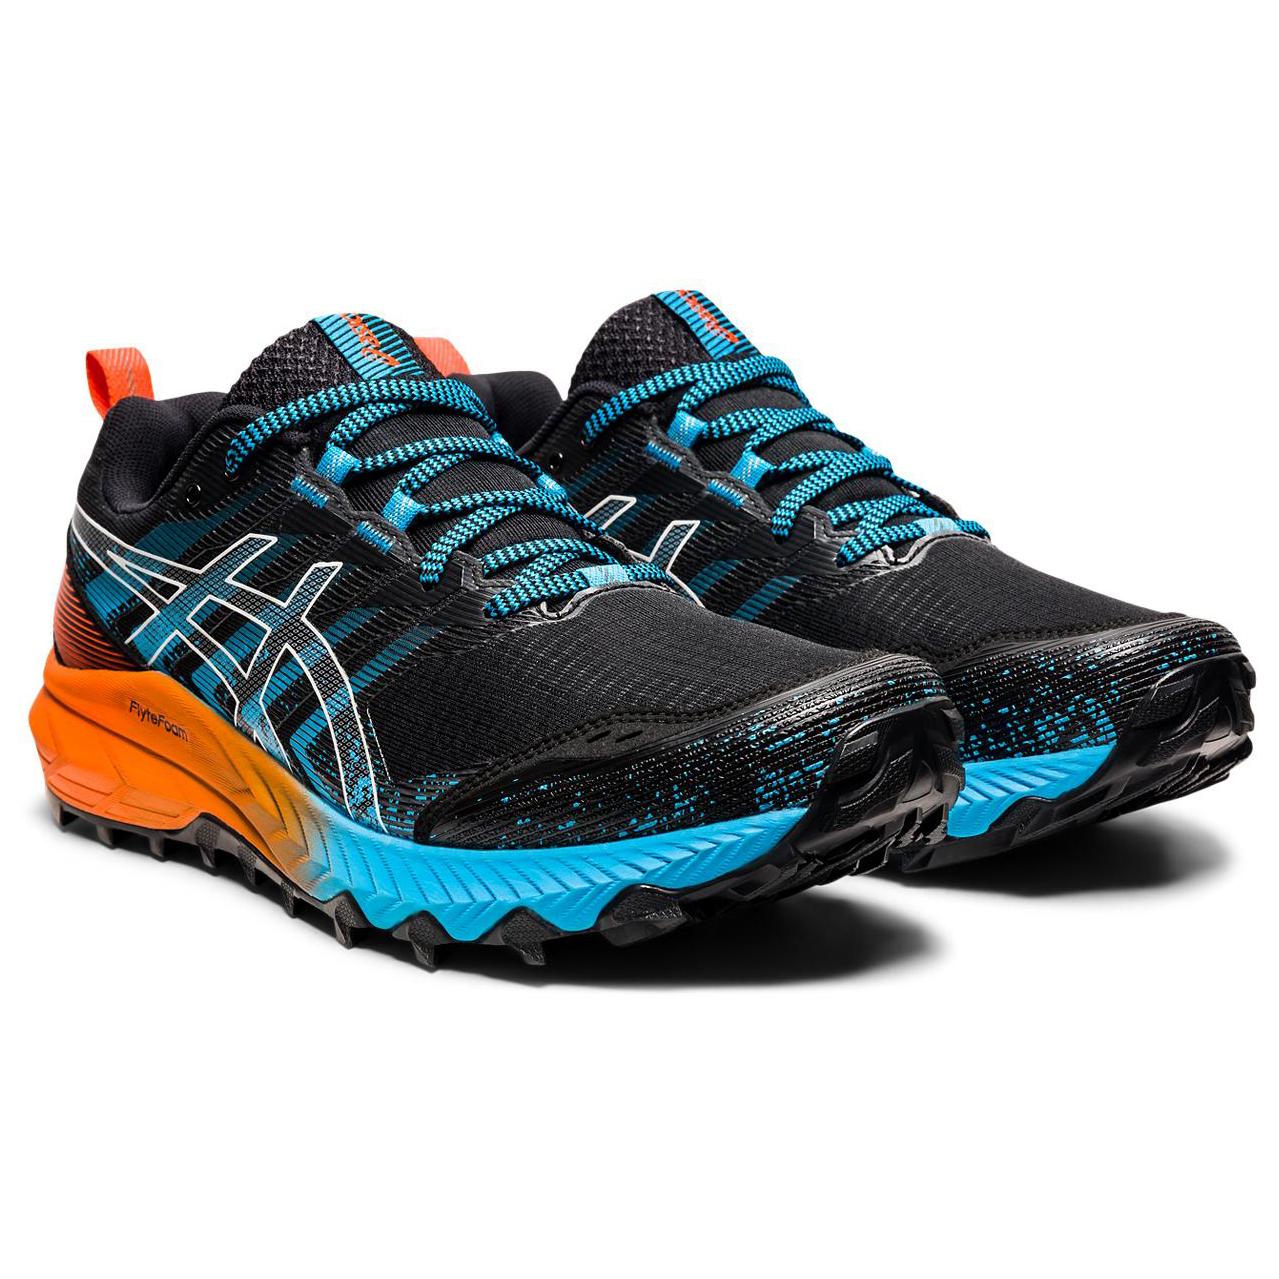 Asics - Gel-Trabuco 9 - Trail running shoes - Black / White   8 (US)